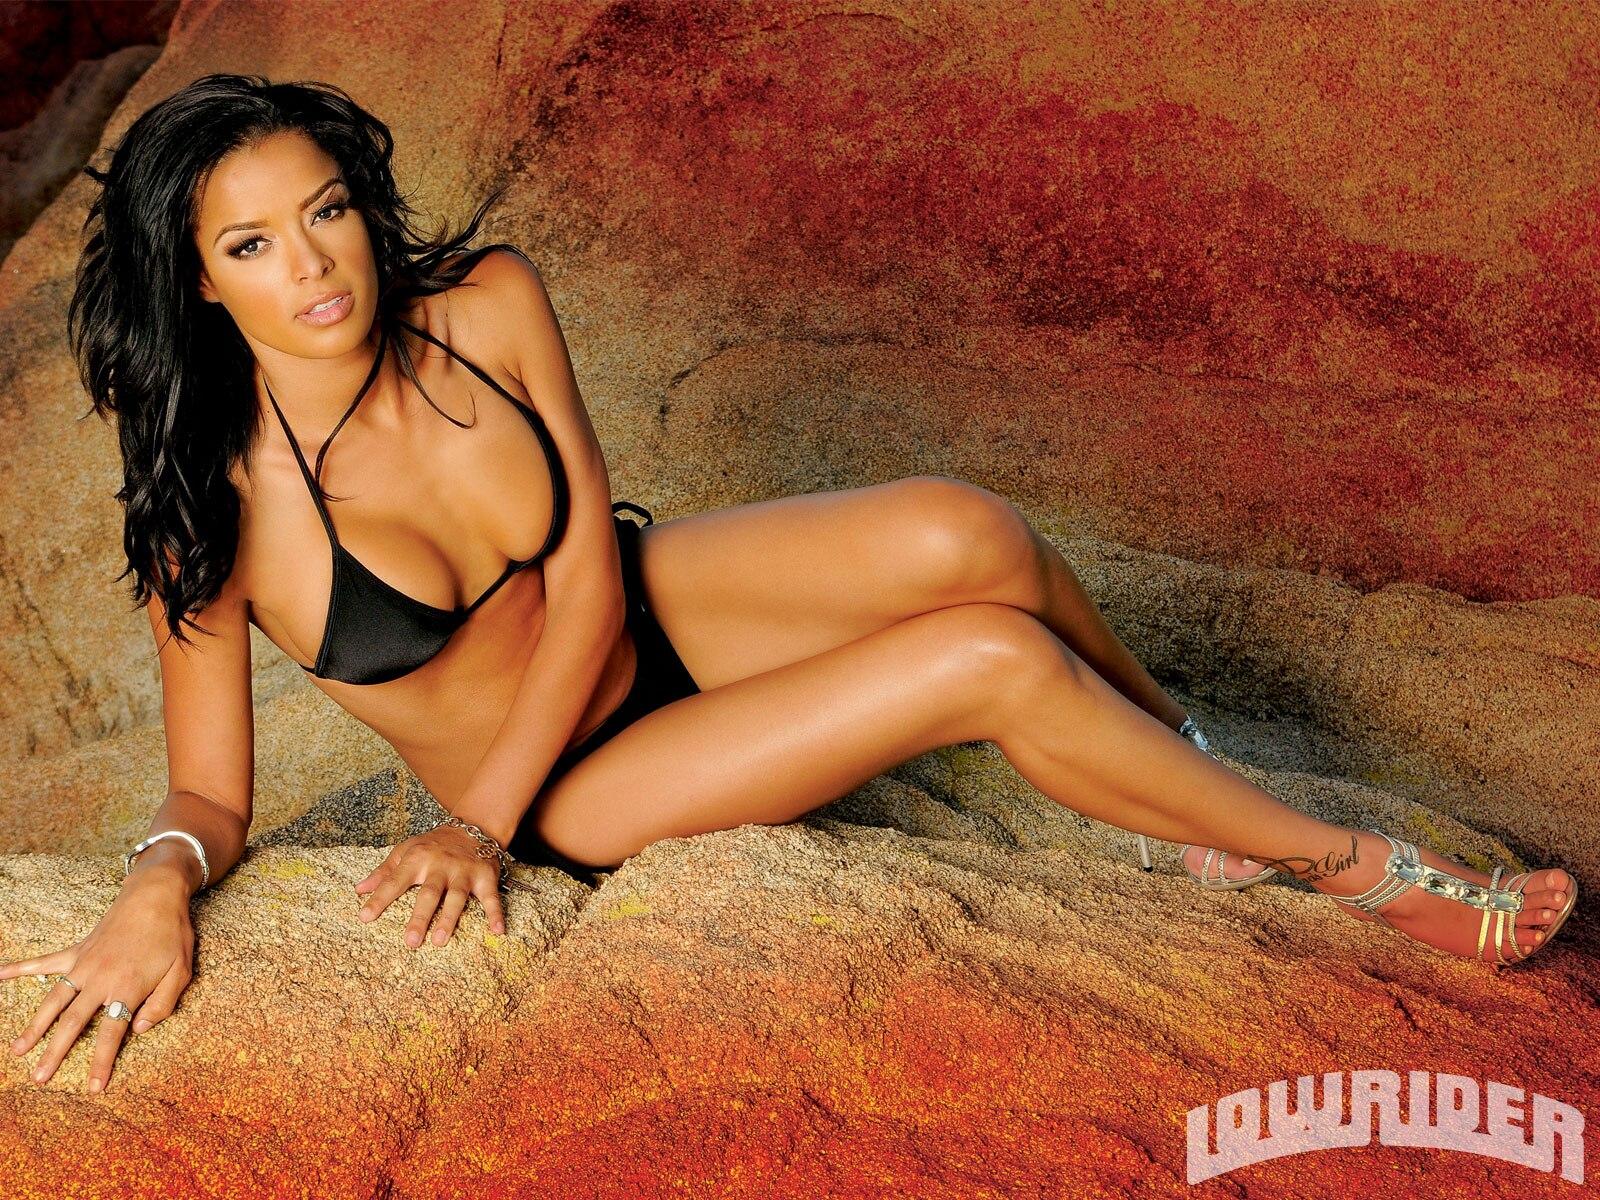 Lowrider bikini models